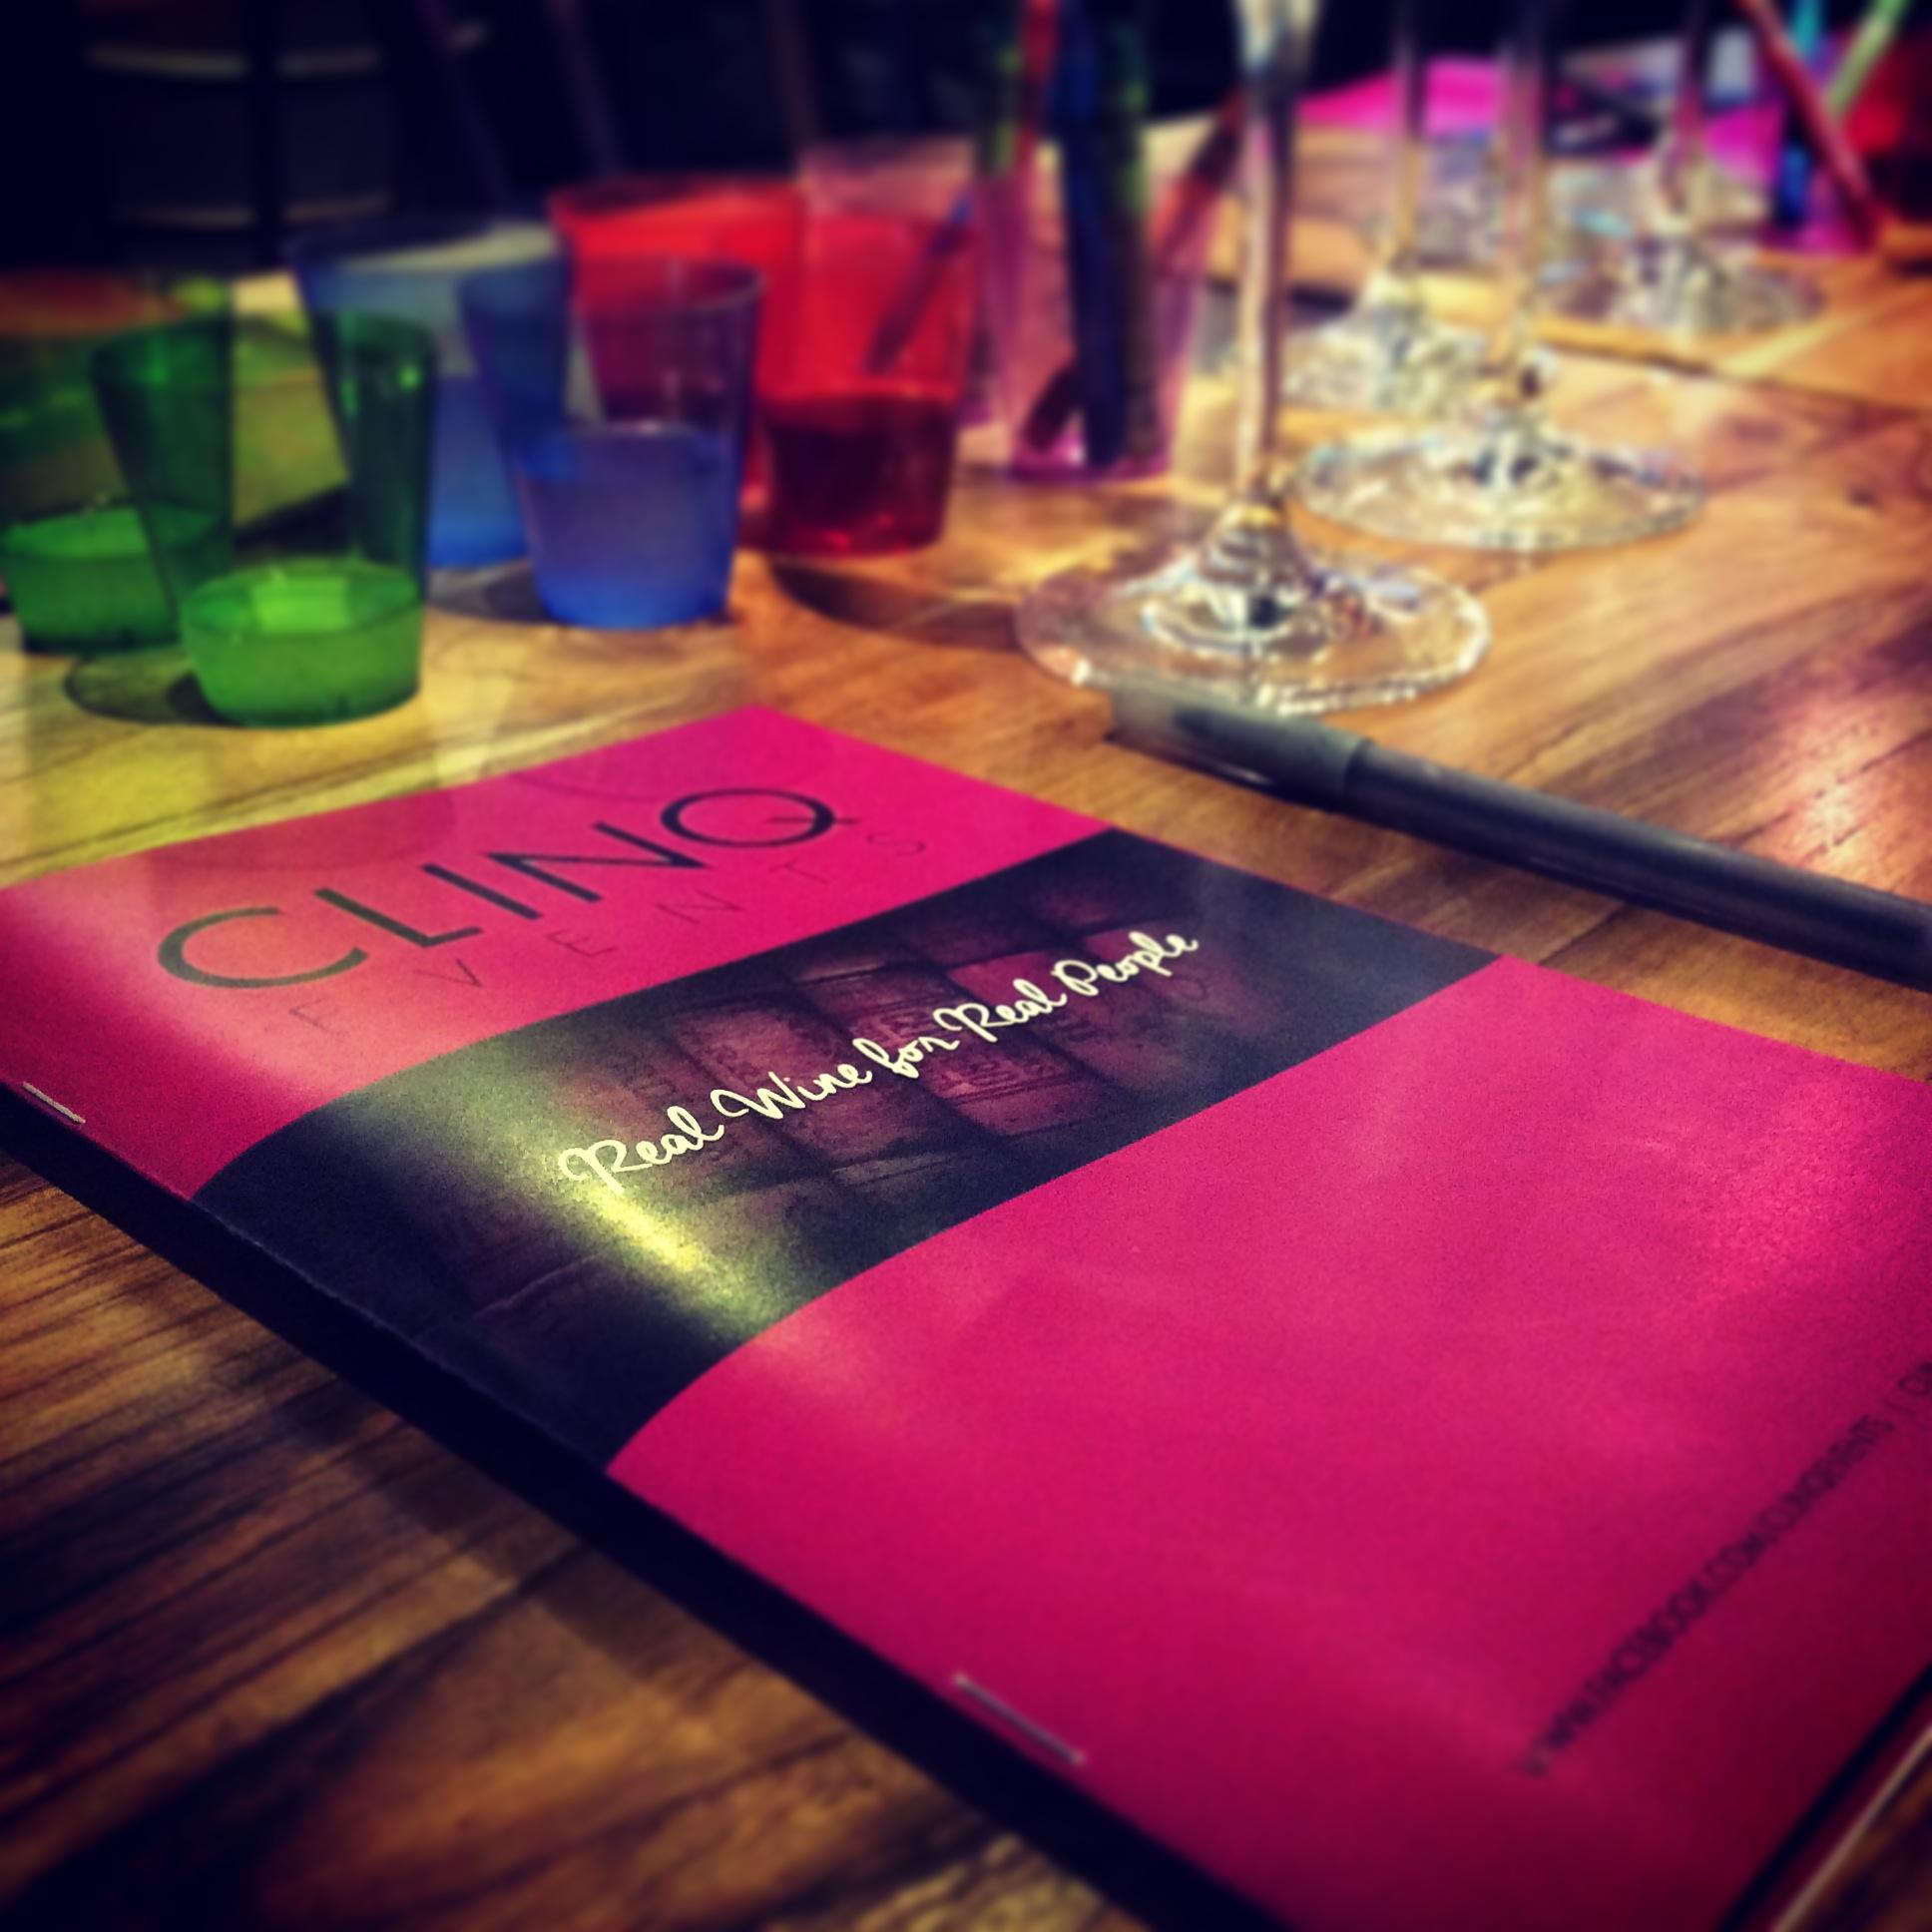 clinq_book_table